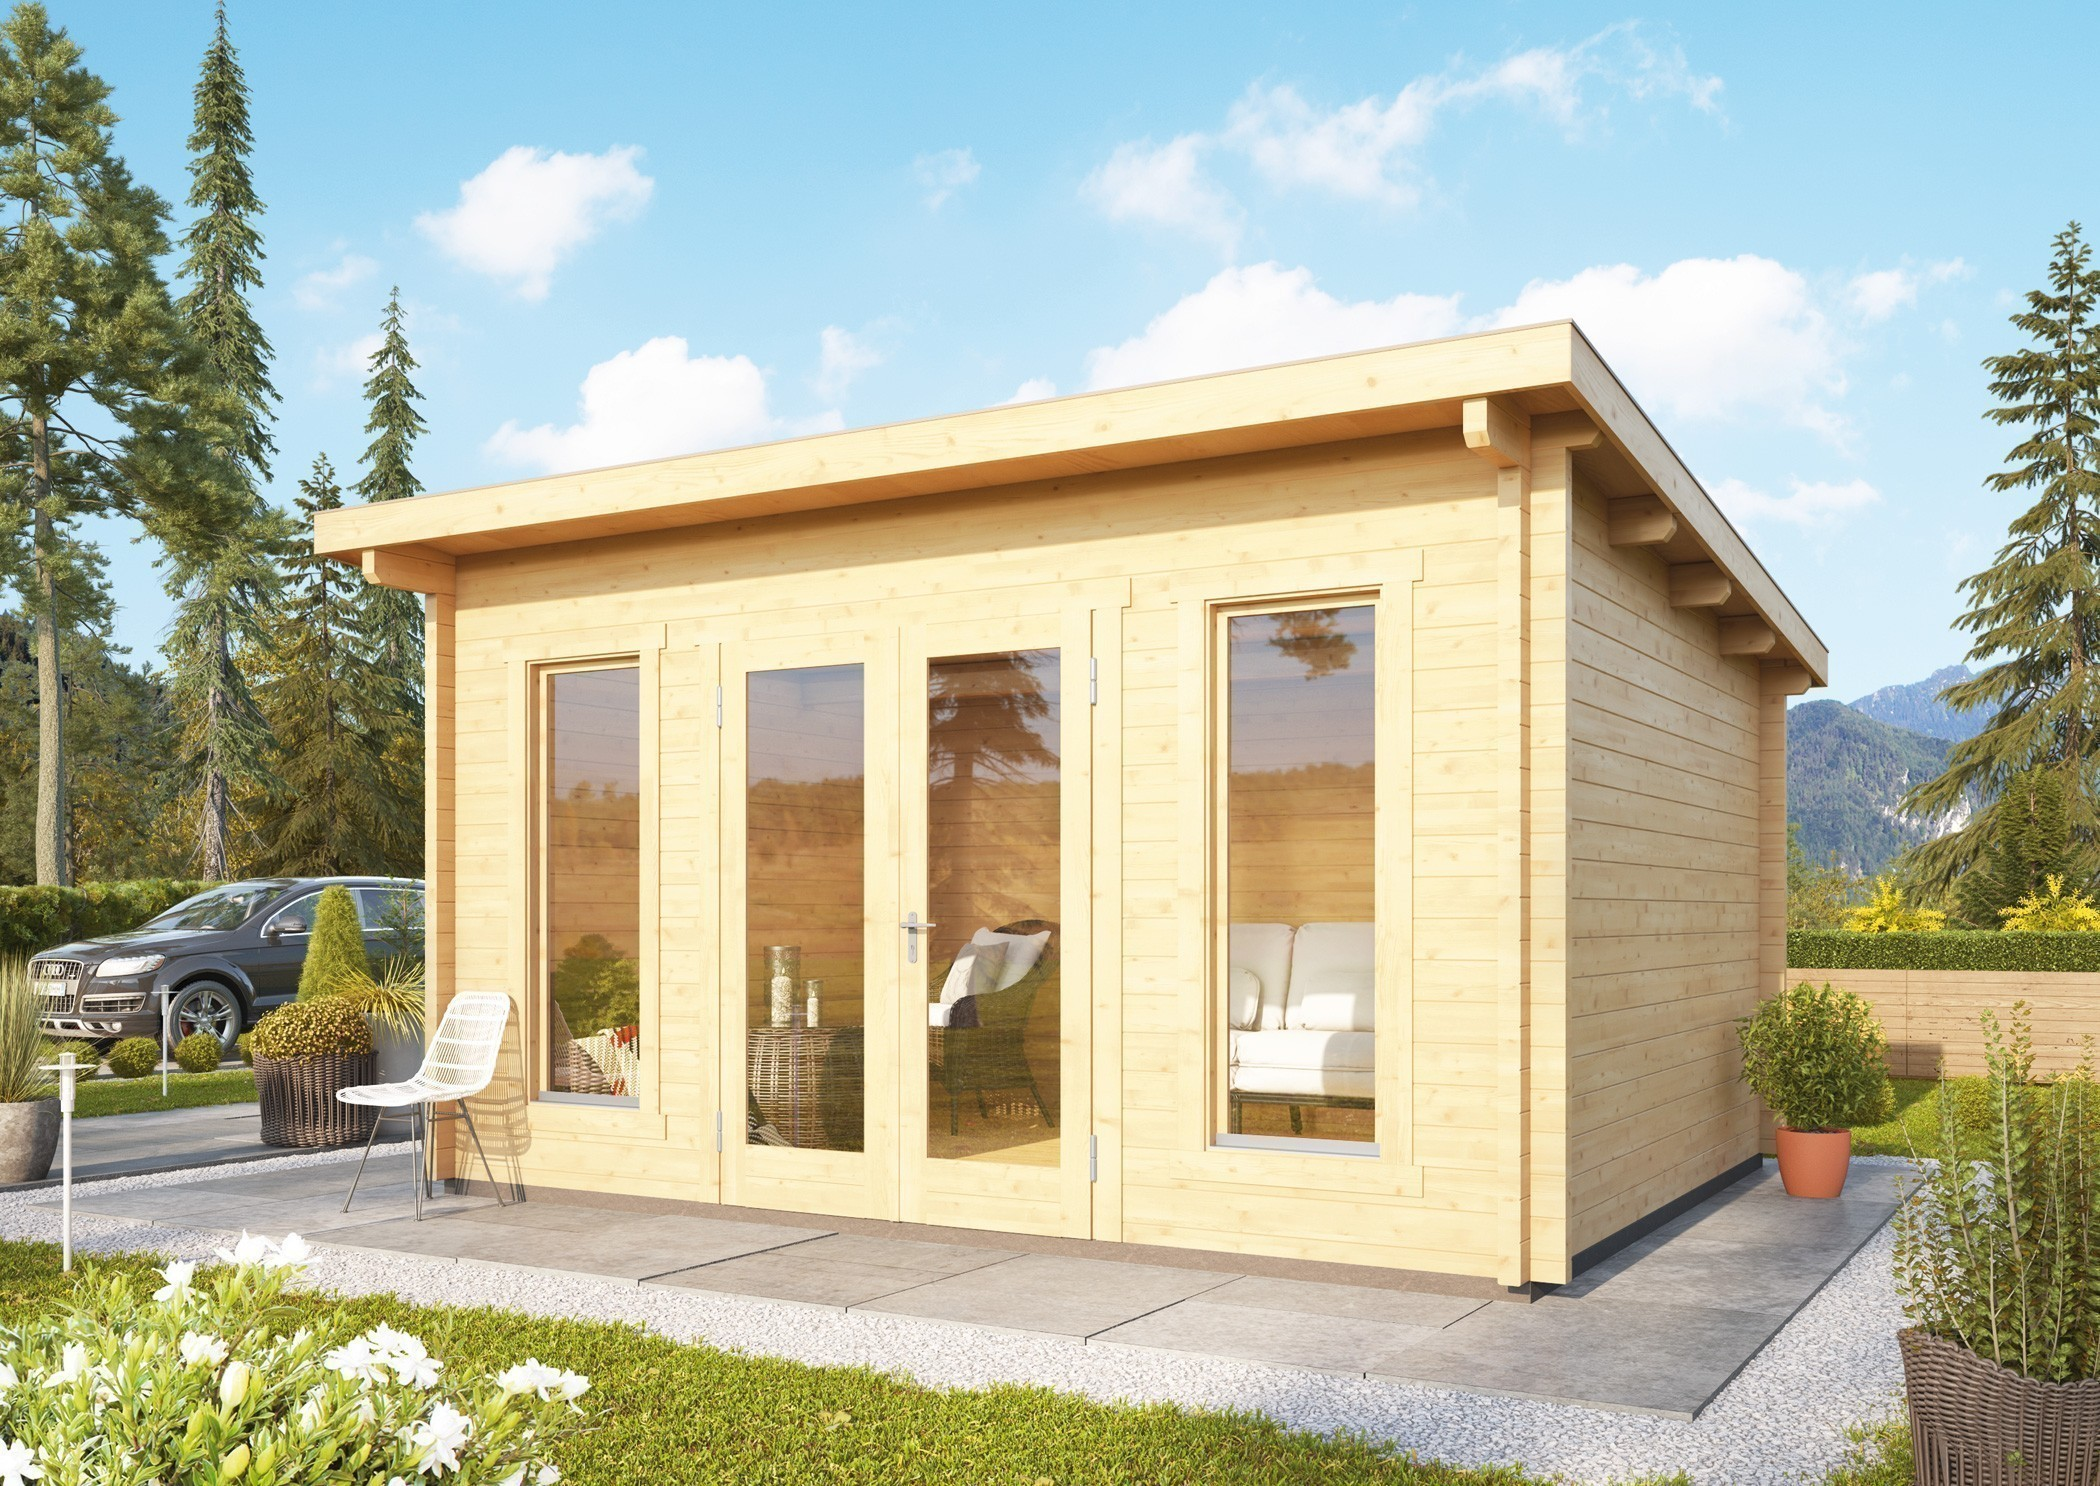 WoodFeeling Gartenhaus 70mm Stavanger 1 natur 400x360cm Bild 1